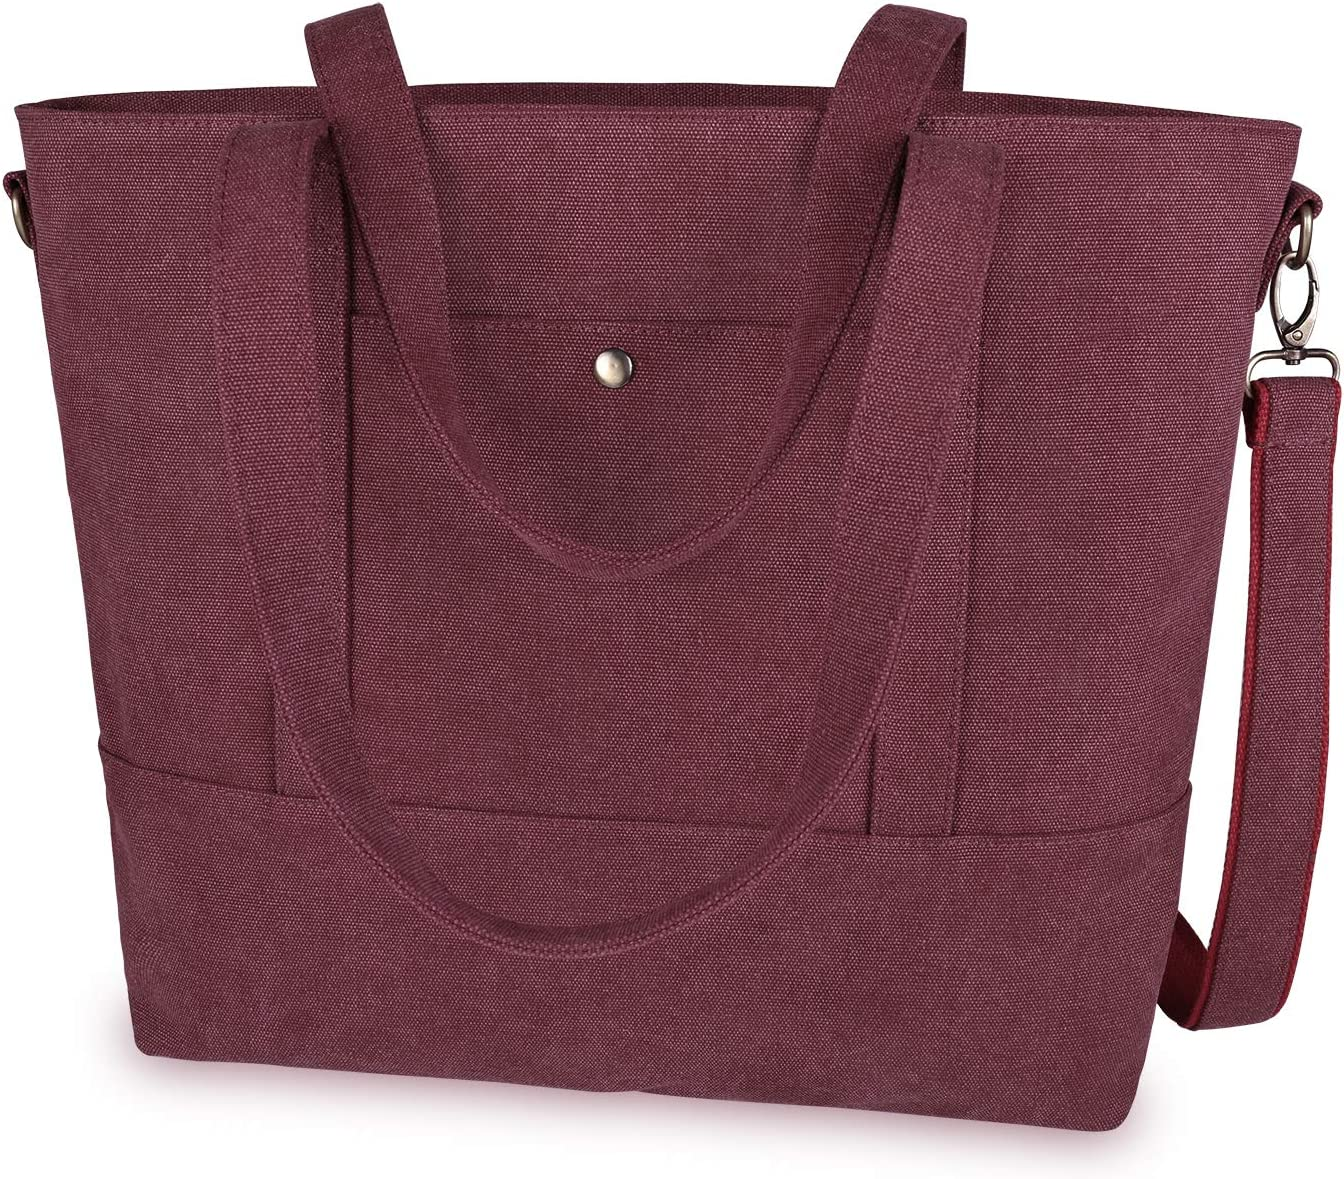 IDAILU Canvas Laptop Tote Bag for Women Fits 13 14 Inch Computer Large Capacity Work Travel Shoulder Handbag with Padding (Burgundy)